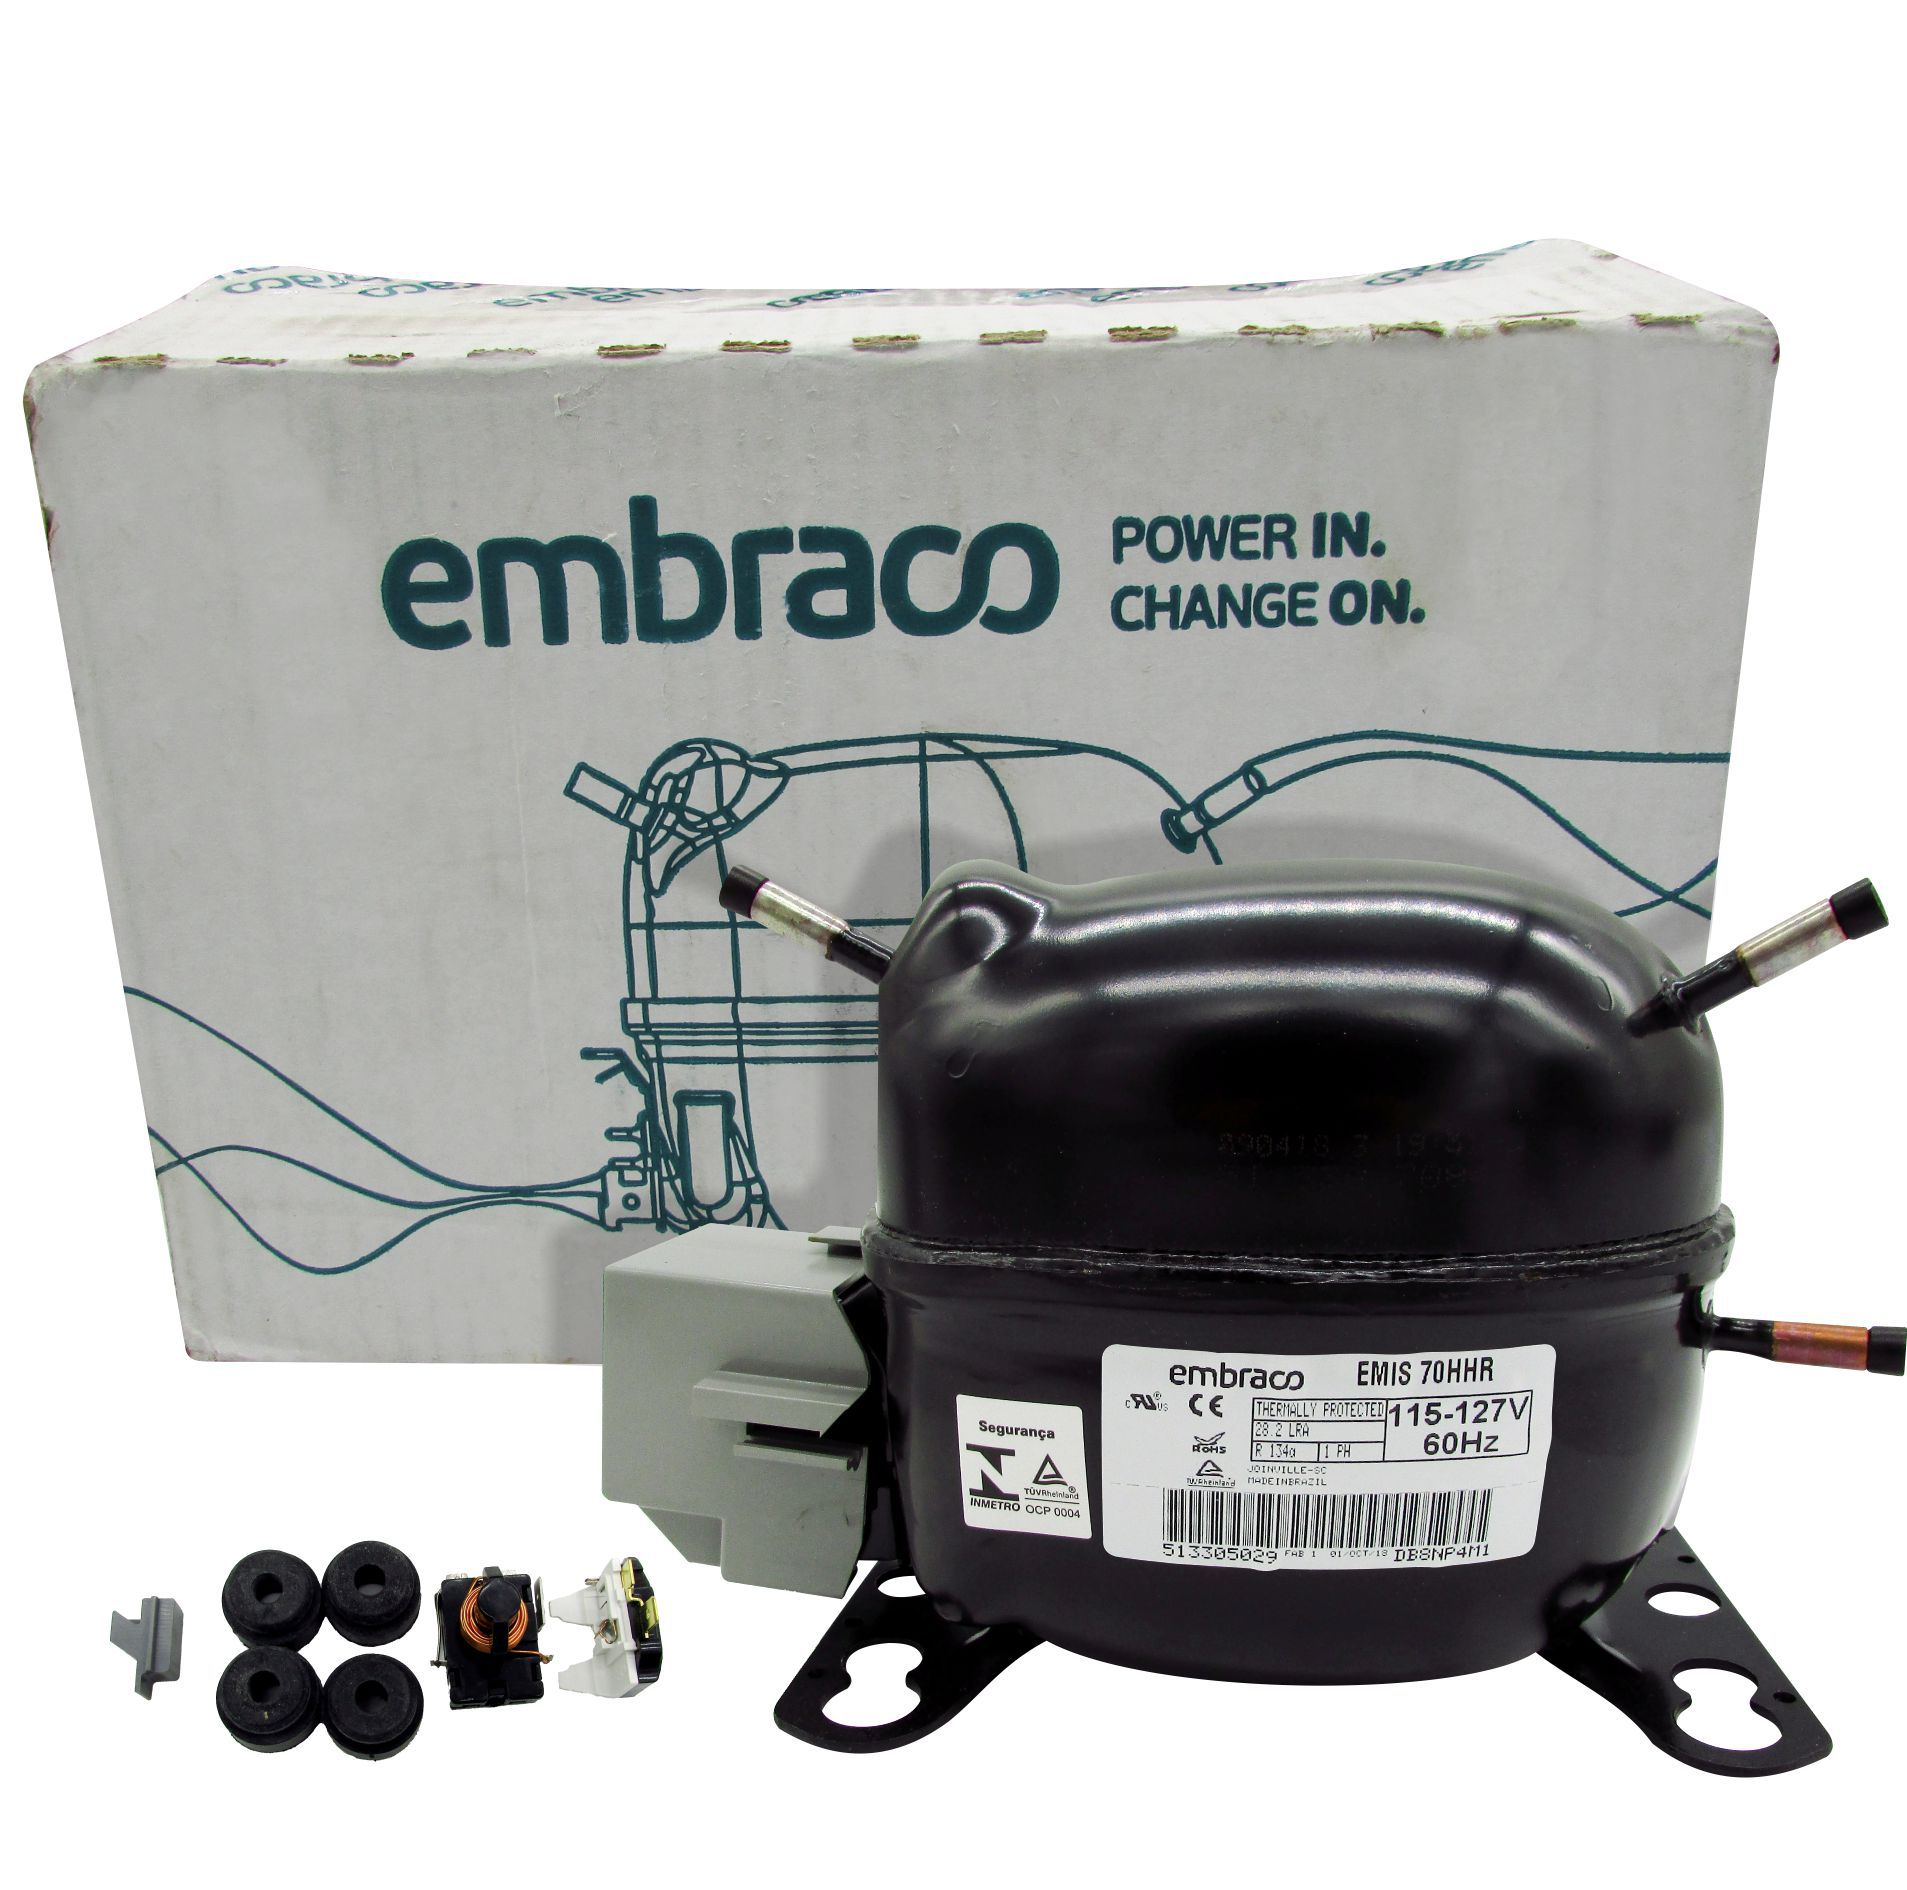 Motor Compressor Embraco 1/5Hp R134a Original EMIS70HHR / EMI70HER